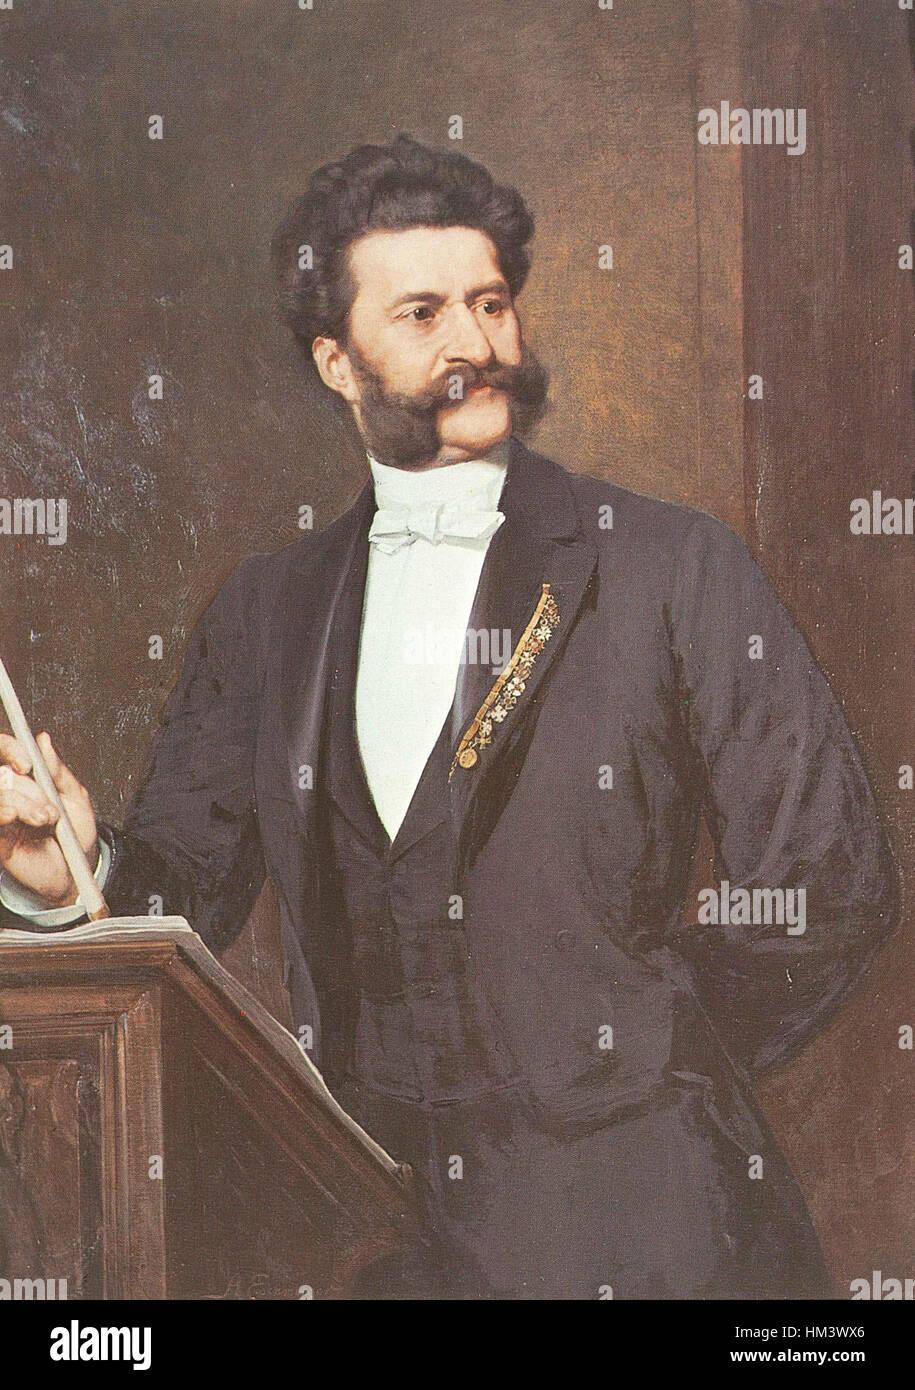 Johann Strauss II by August Eisenmenger 1888 Stock Photo